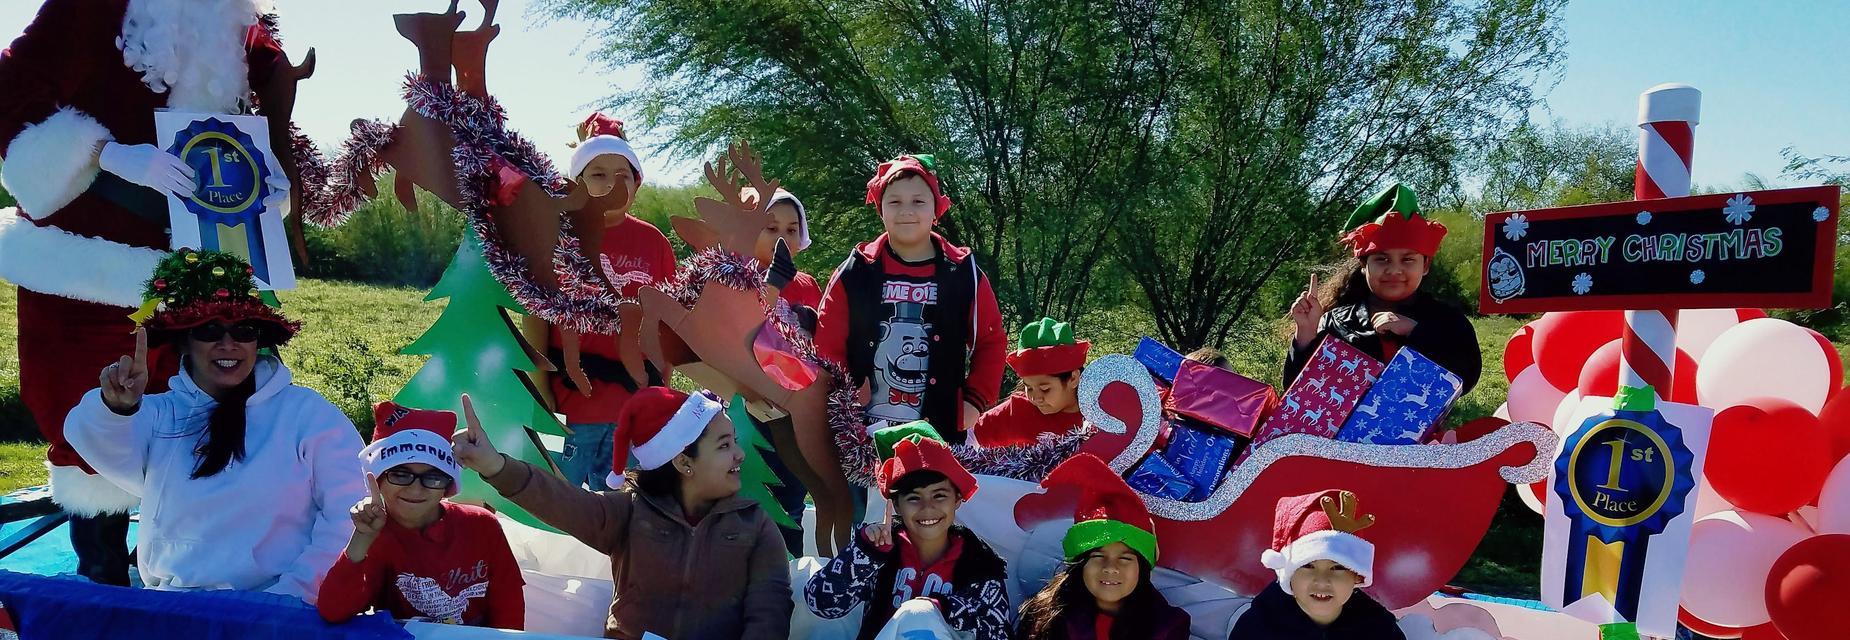 Waitz float at Alton Christmas Parade